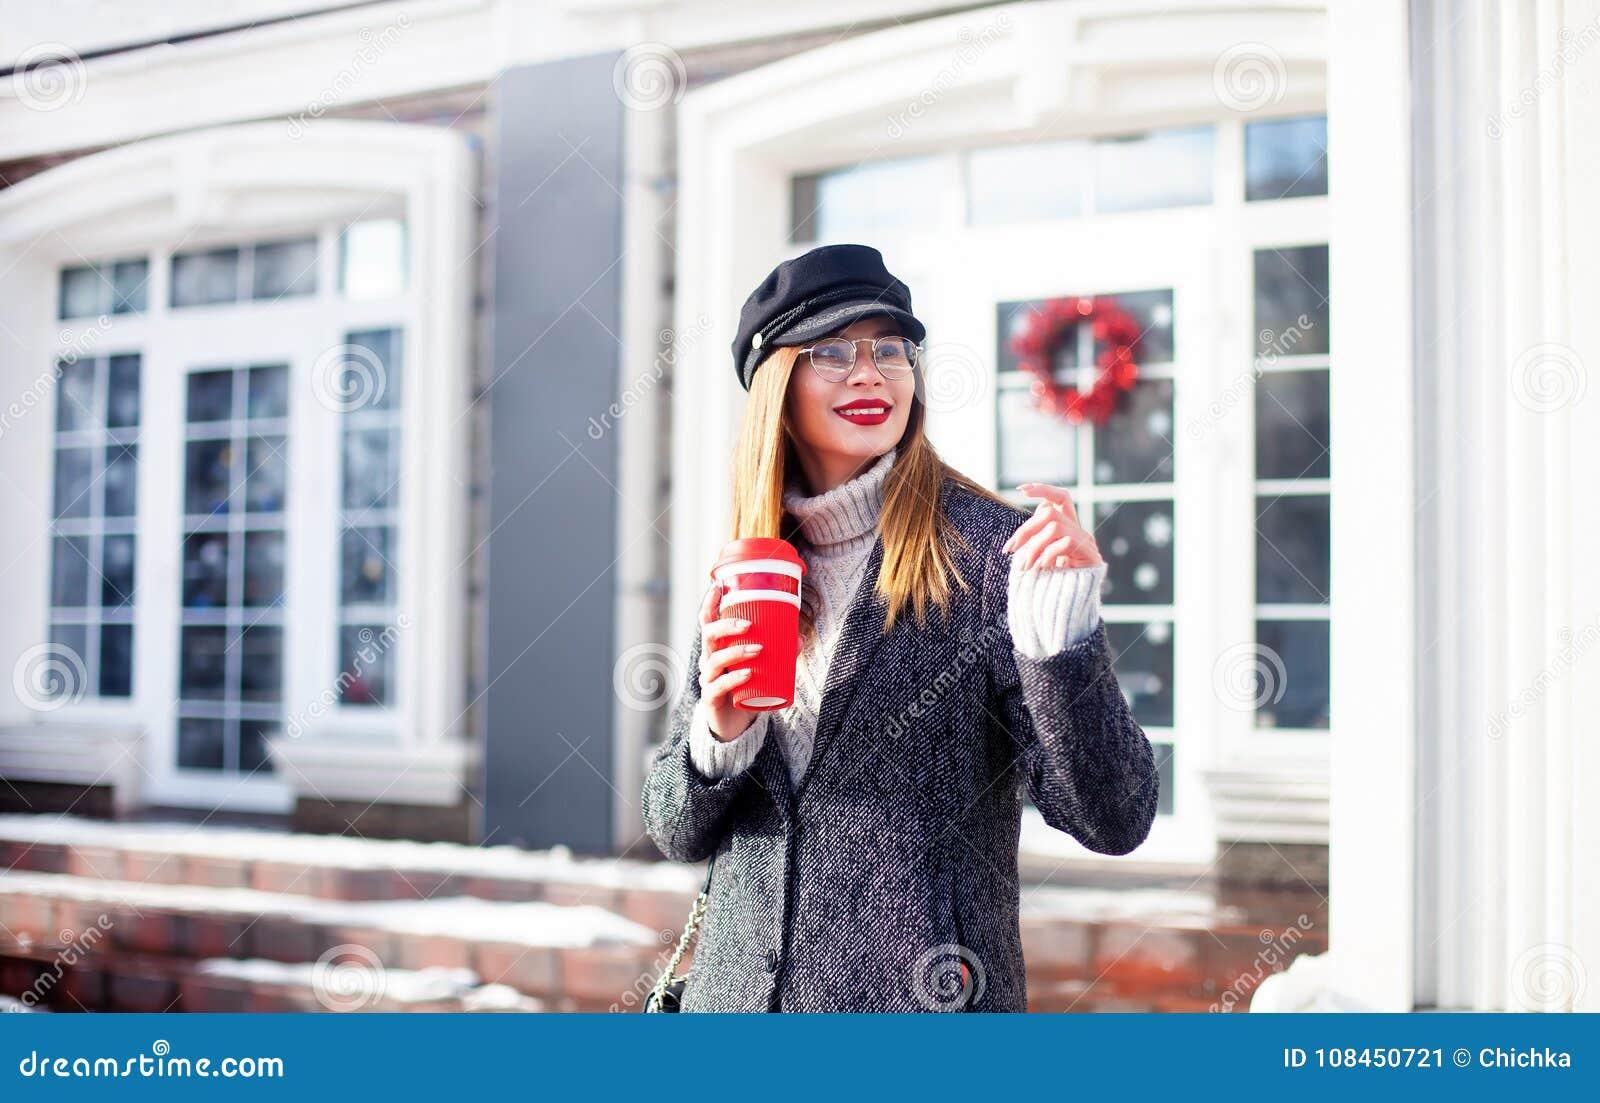 38614a8fd5b2 Stylish Happy Young Woman Wearing Fashionable Glasses